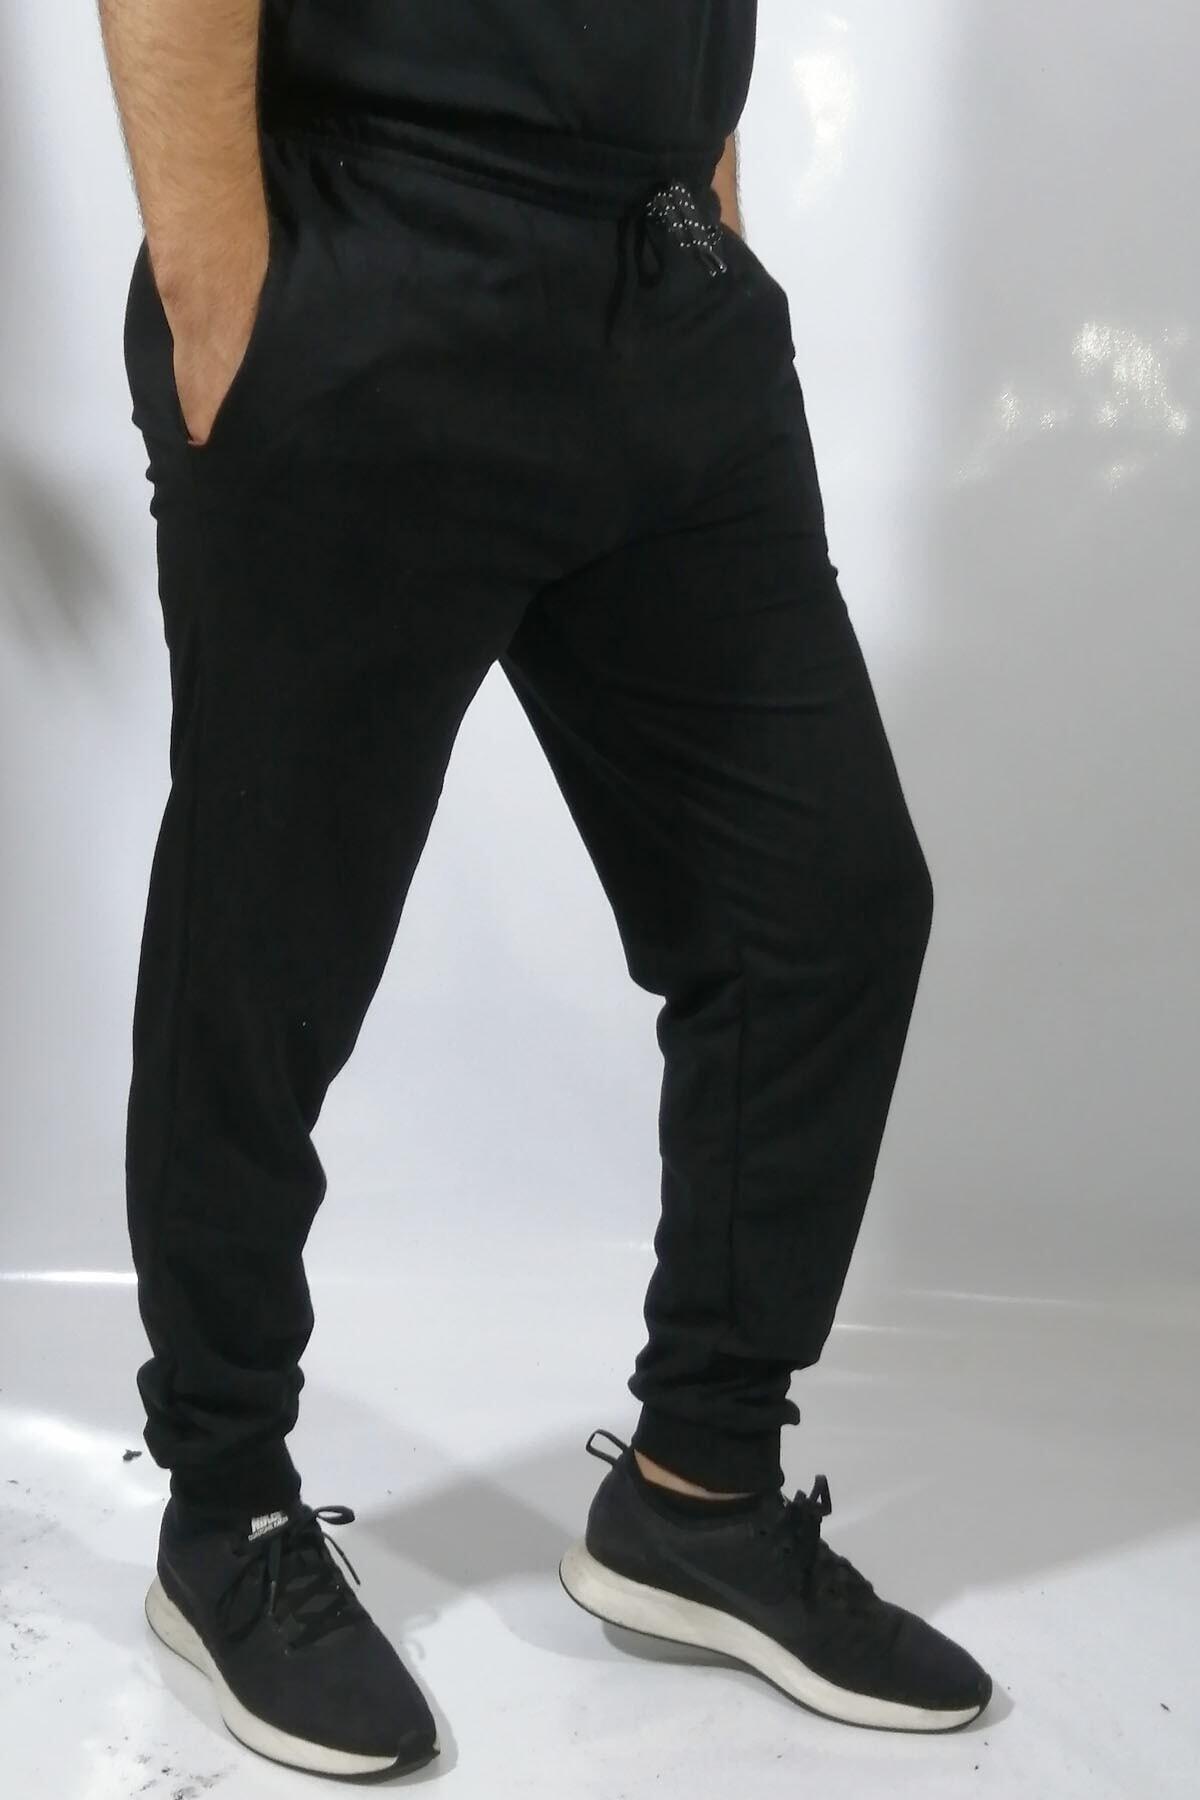 bck Unisex Siyah Paçası Lastikli Eşofman Altı 1